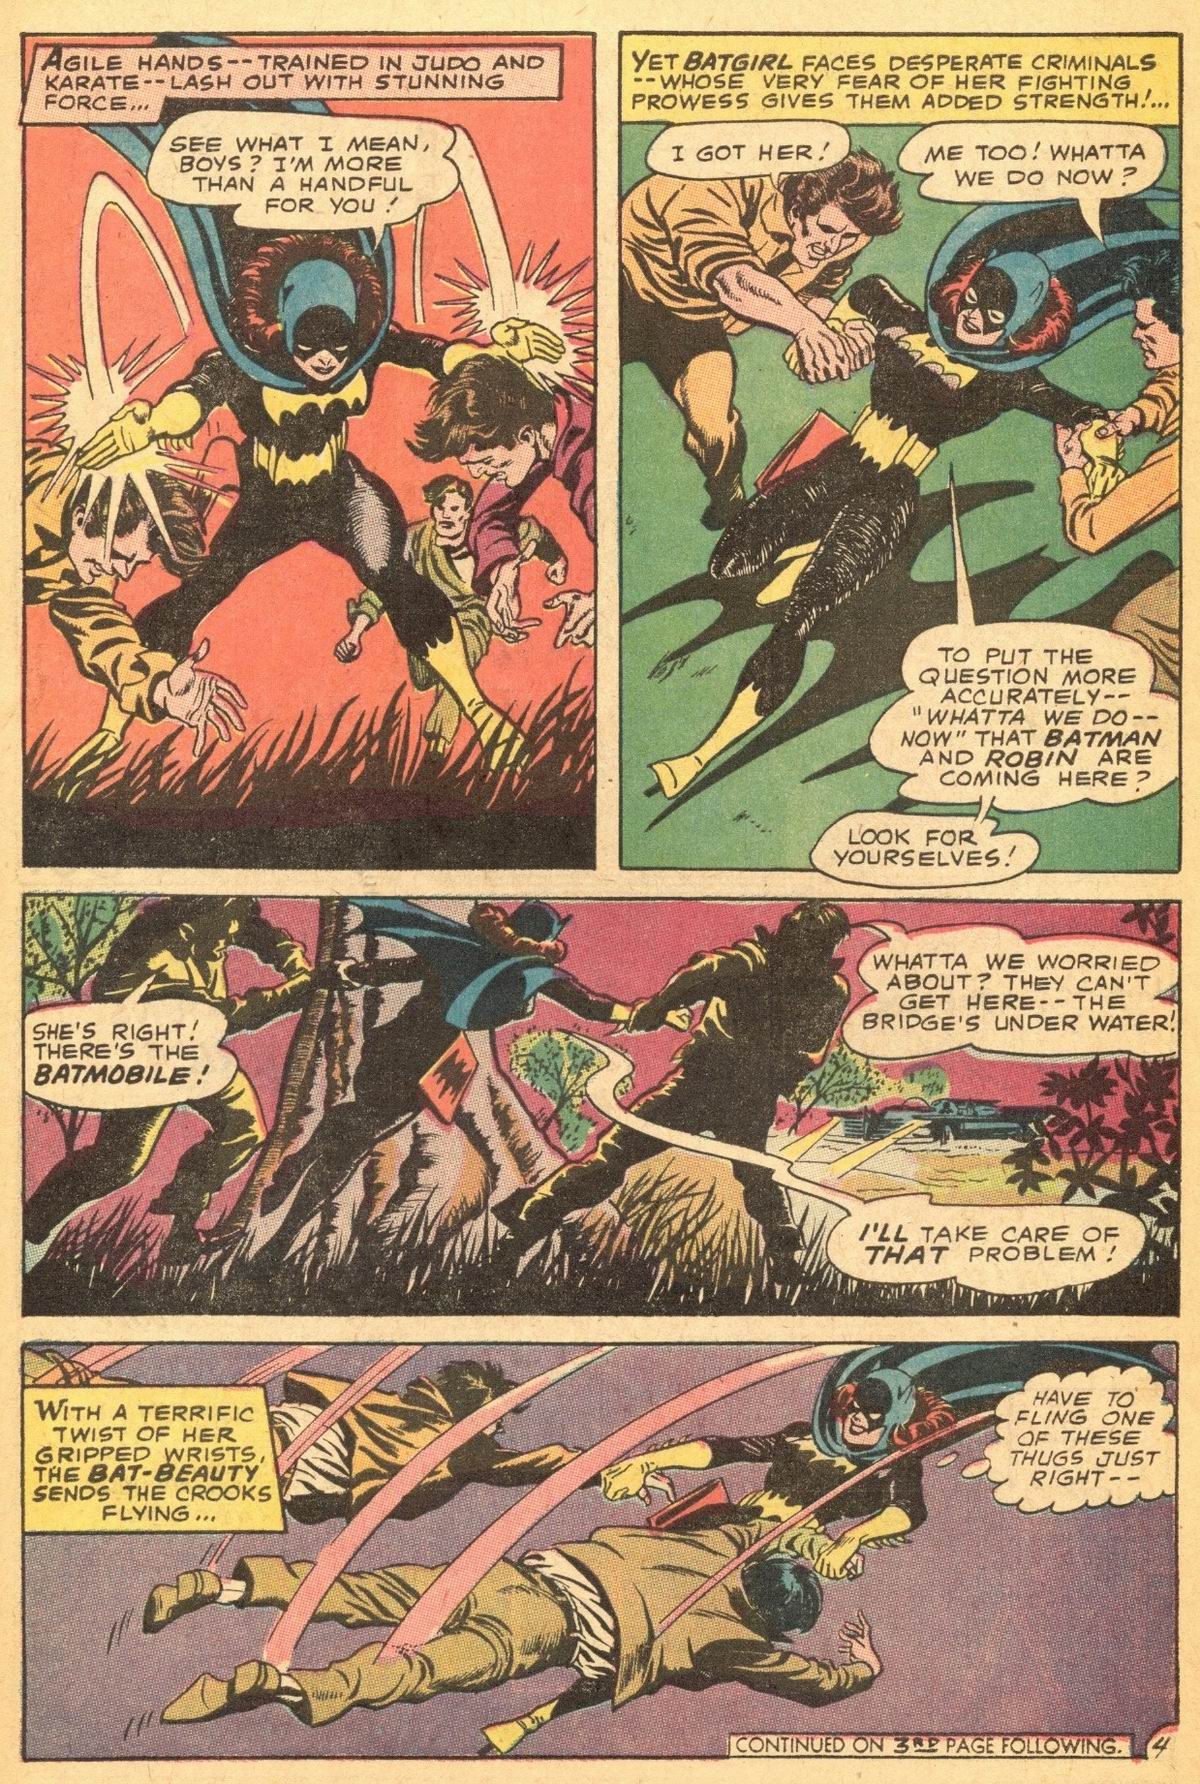 Detective Comics (1937) 369 Page 5